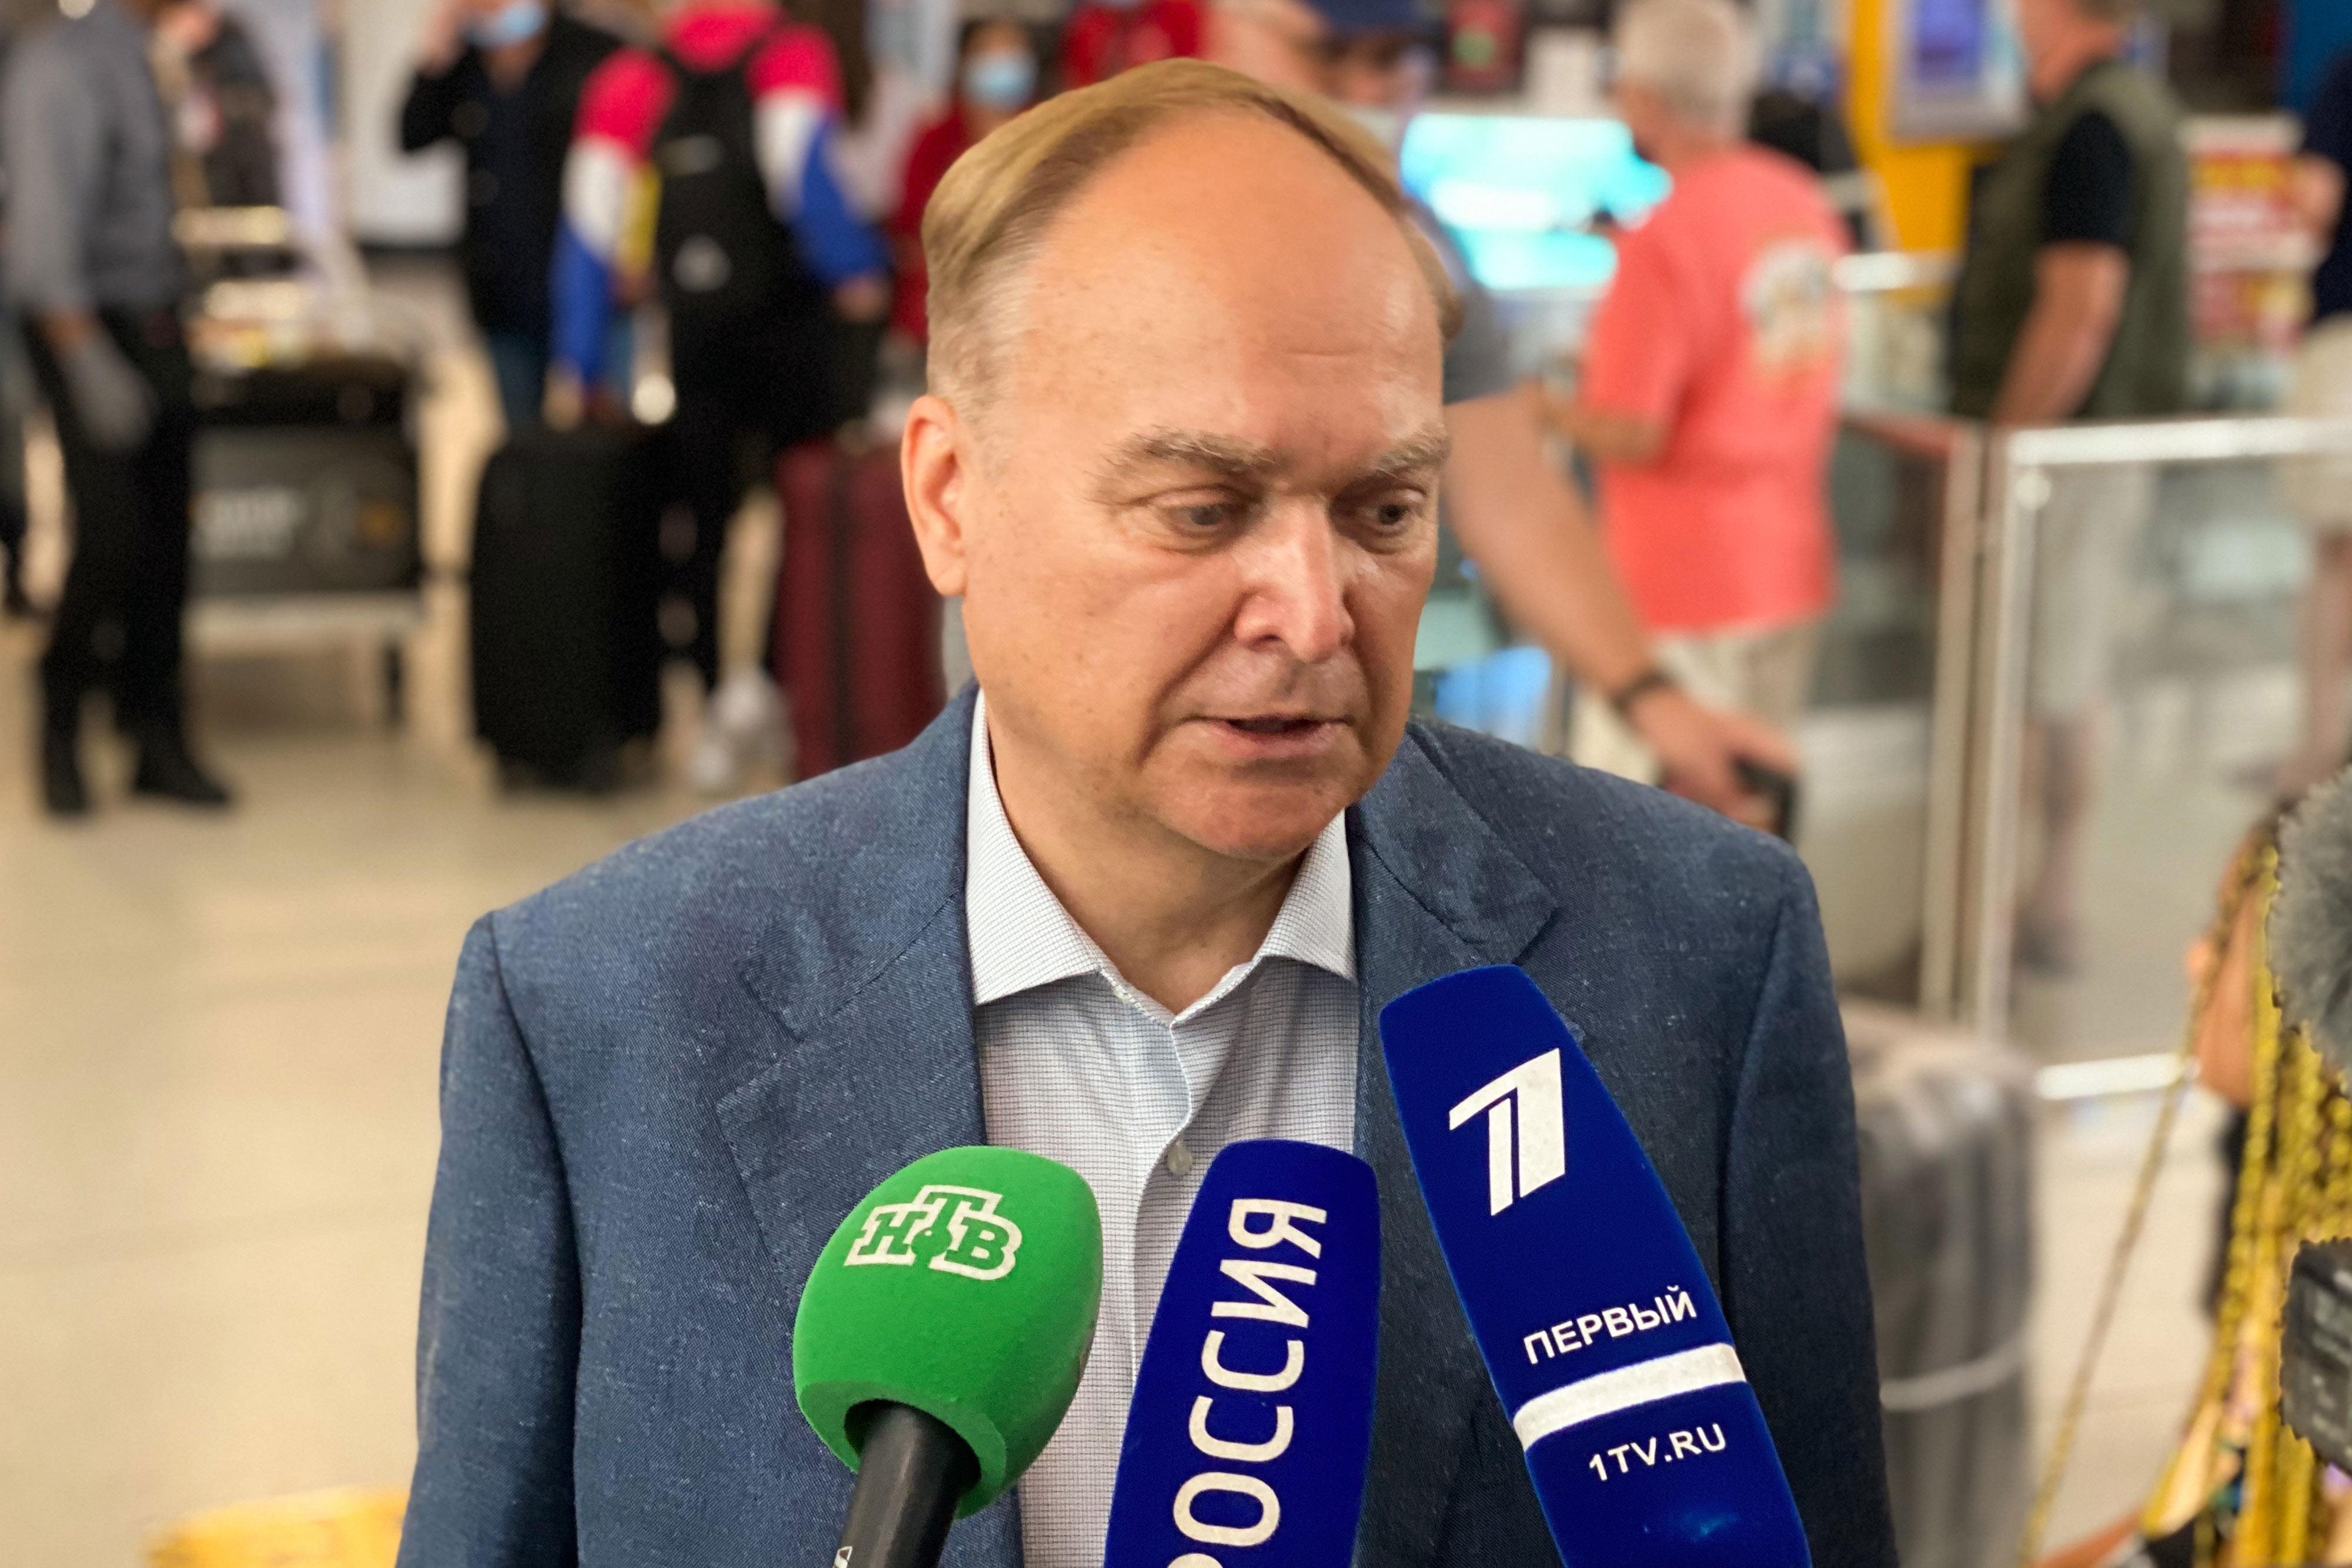 Russian ambassador to US arrives in Washington